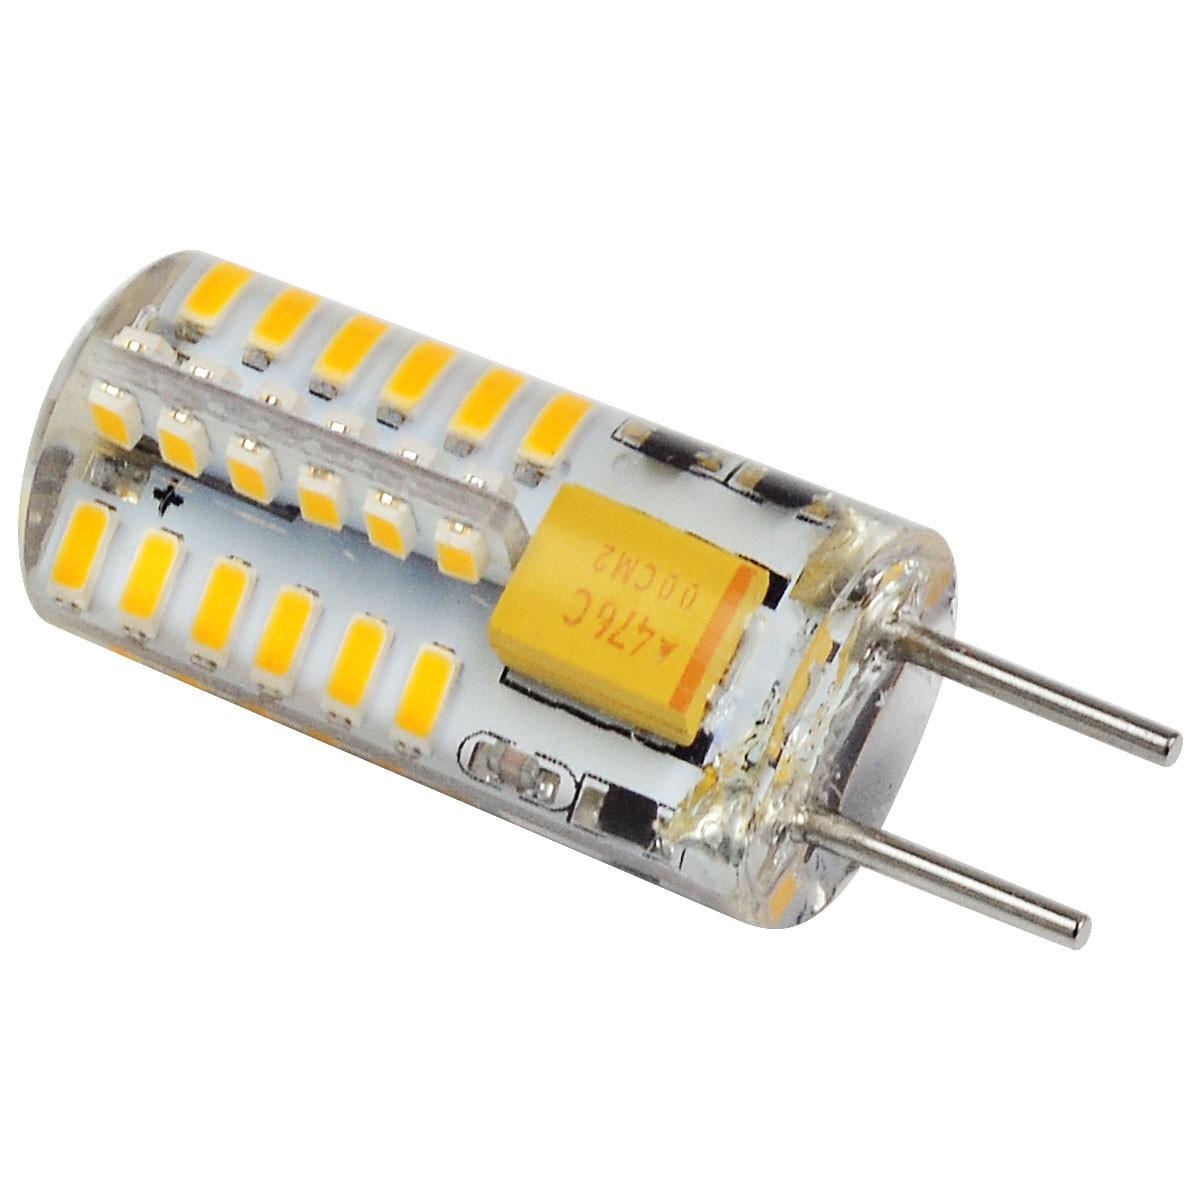 Mengsled Mengs 2w Led Light 48x 3014 Smd Led Lamp Bulb Ac Dc 12v In Warm White Cool